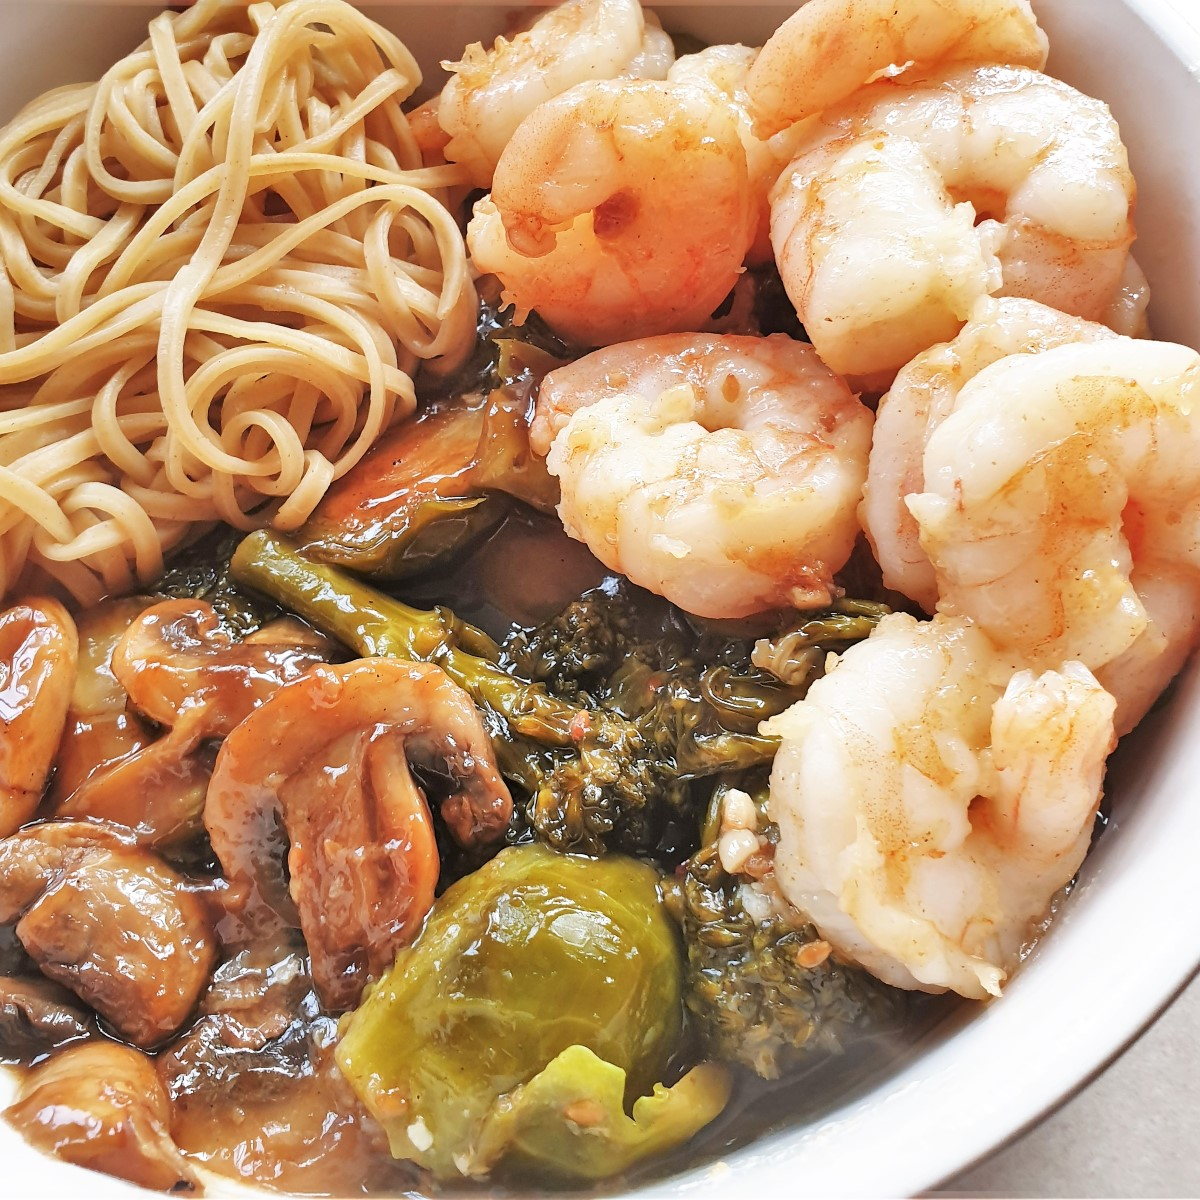 Closeup of a bowl of honey shrimp and steamed vegetables.